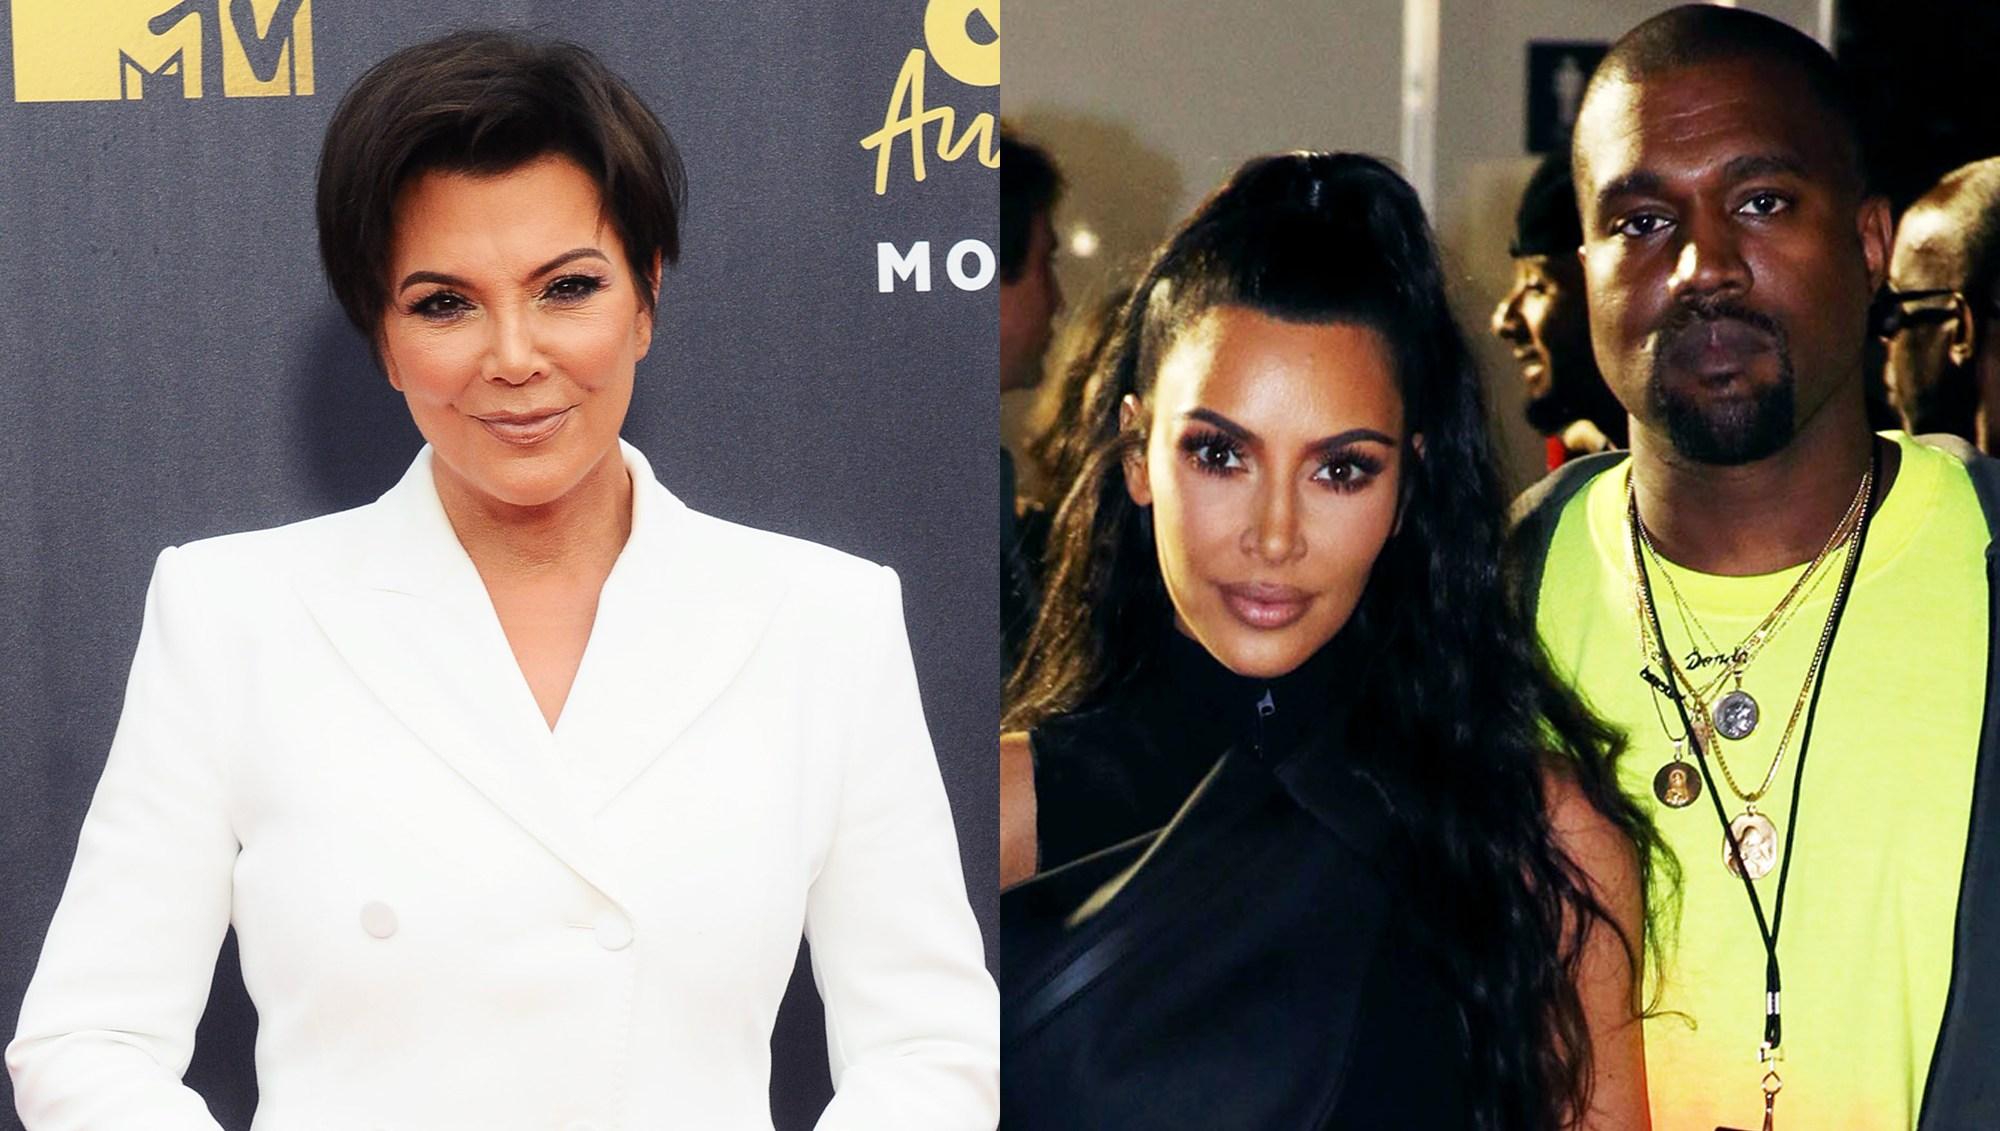 Kris Jenner, Kim Kardashian and Kanye West.